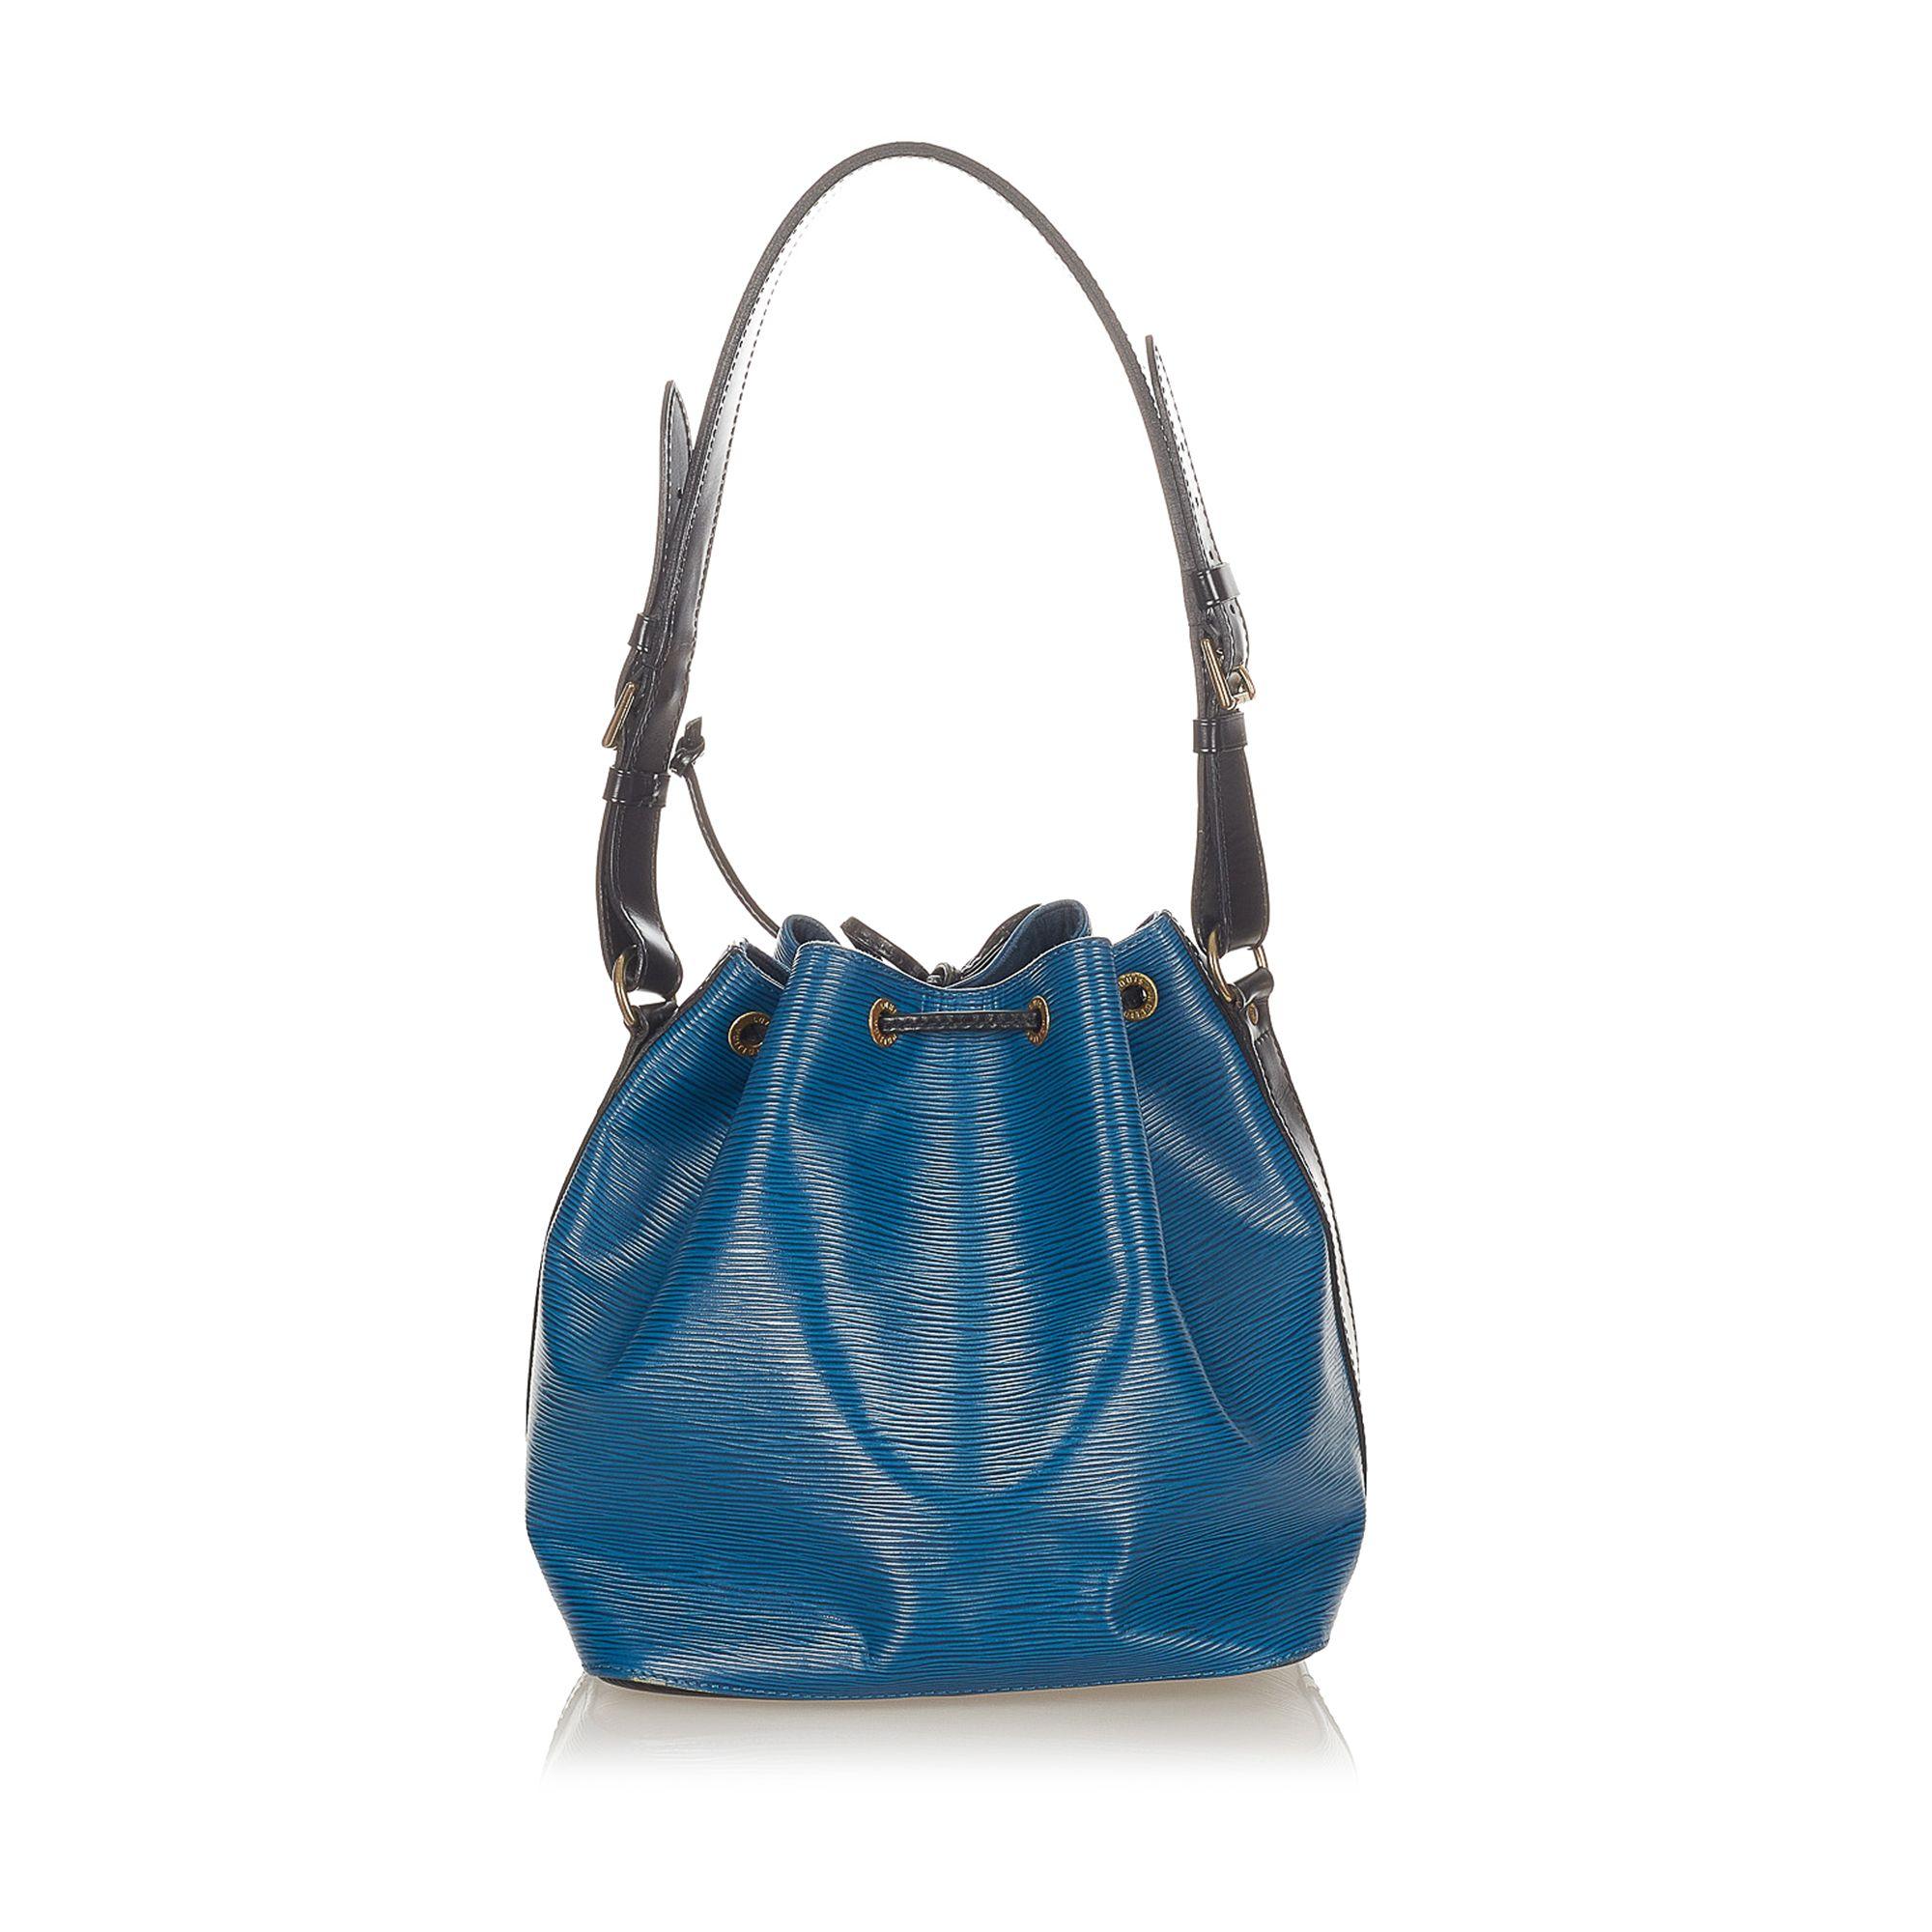 Vintage Louis Vuitton Epi Noe Bucket Bag Blue